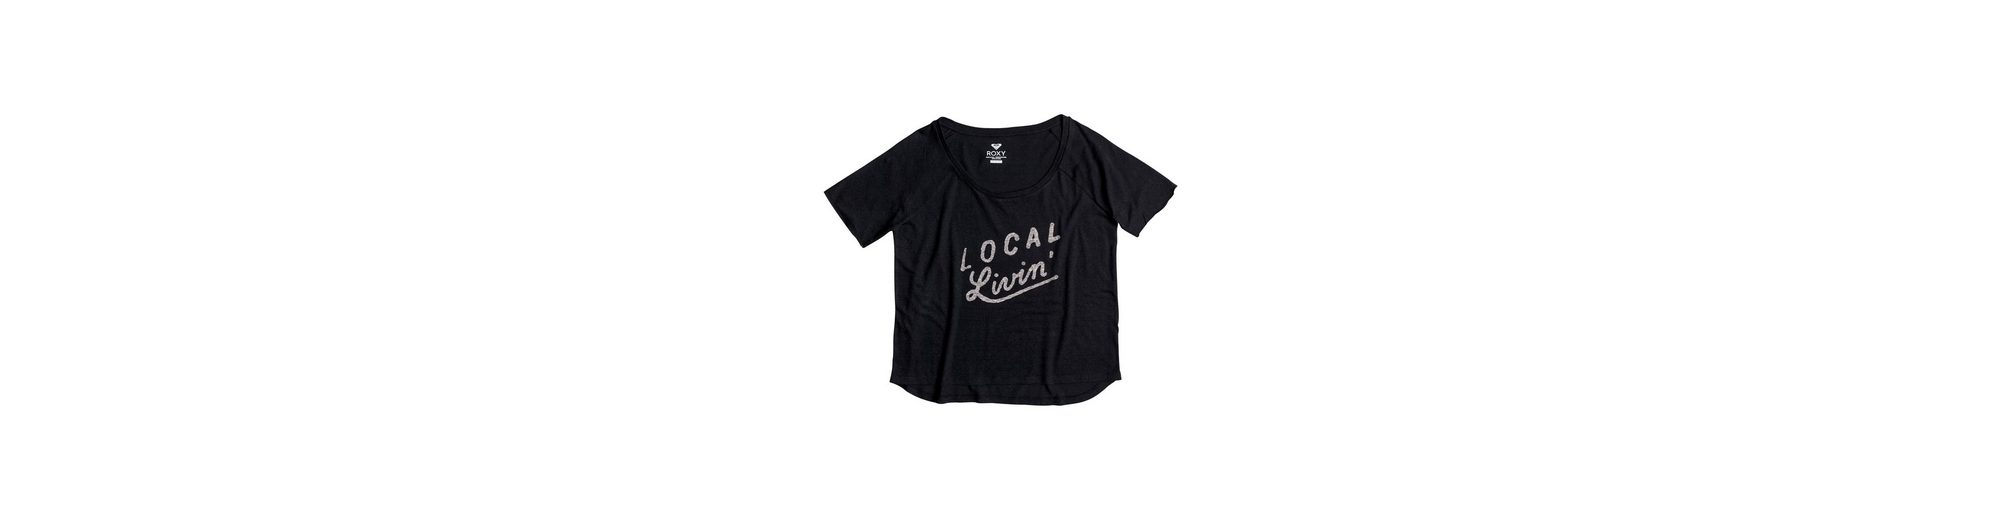 Roxy T-Shirt Fashion Friend Local Livin - T-Shirt Kaufen Online-Outlet 5VTHIfYr1w